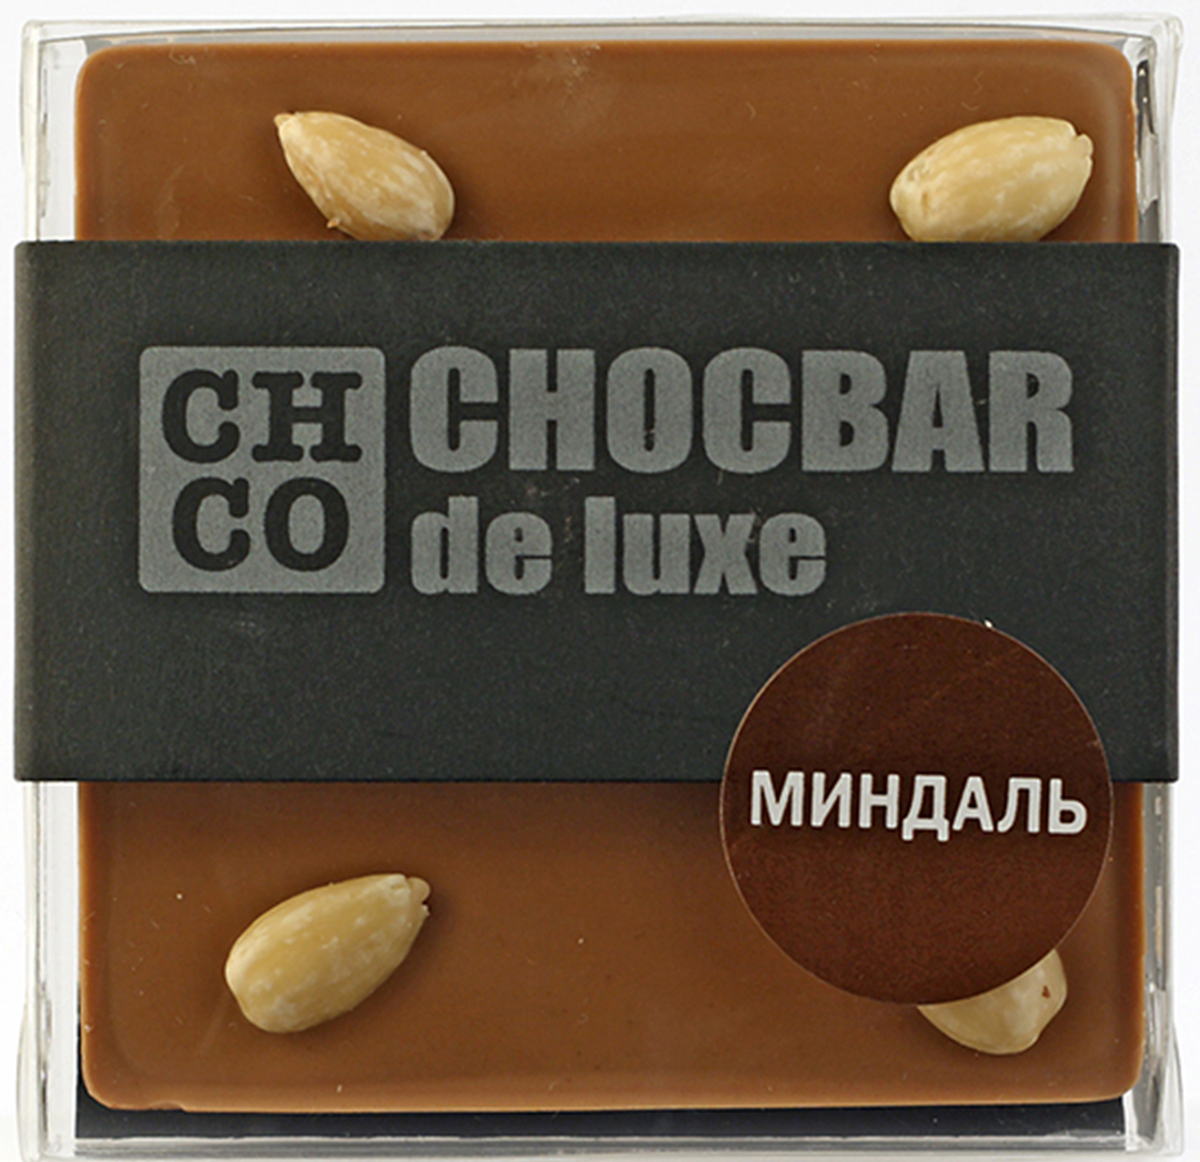 Chco Chocbar De Luxe Milk Миндаль молочный шоколад, 85 г chco chocbar milk 40% молочный шоколад 60 г